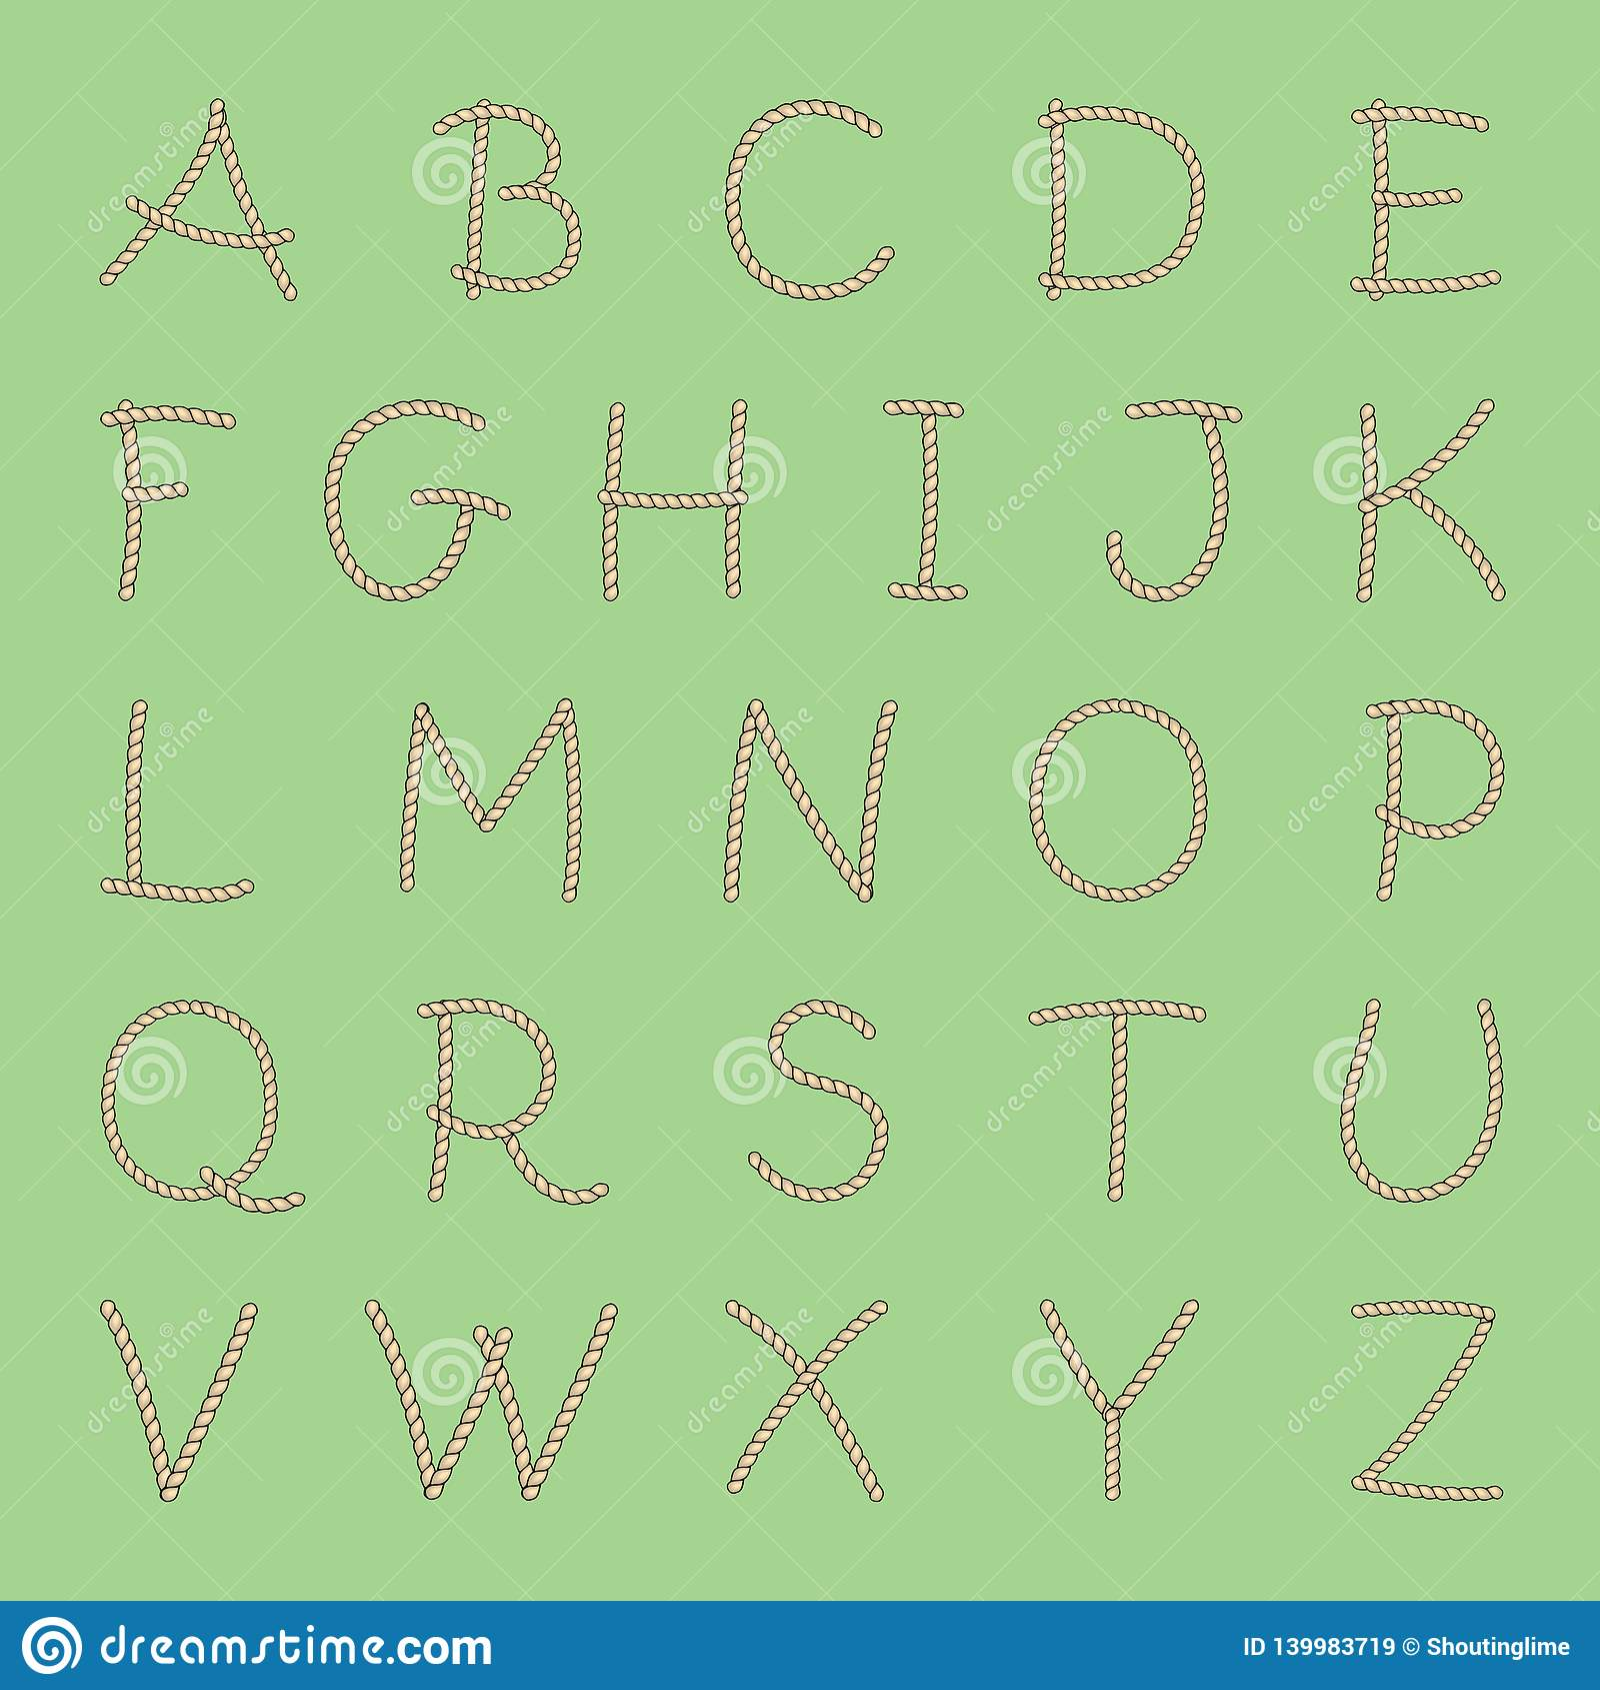 Vectorkabel Engels Alfabet Alle Brieven A-Z